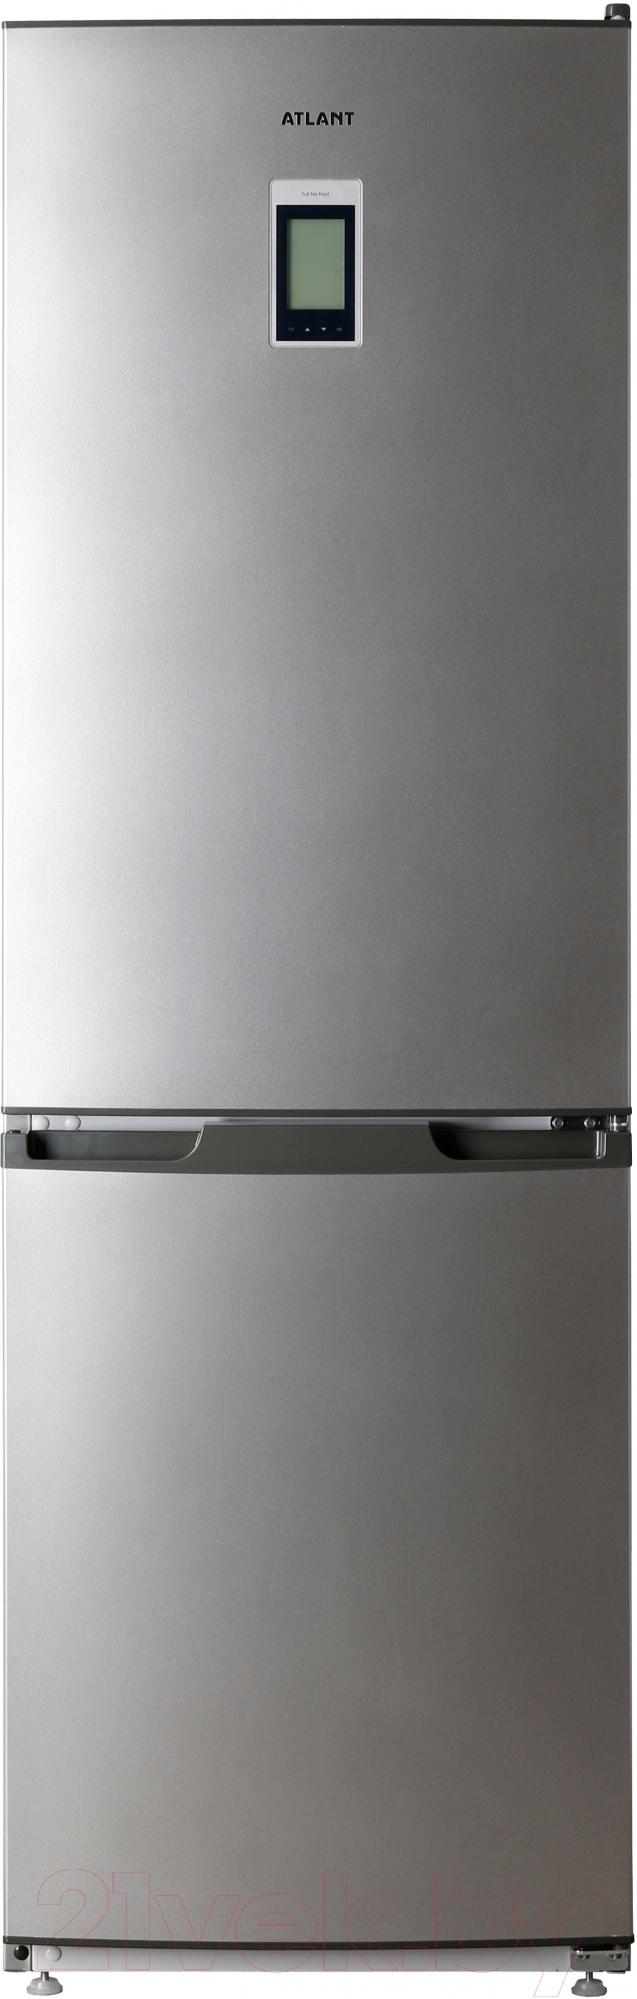 Купить Холодильник с морозильником ATLANT, ХМ 4421-089 ND, Беларусь